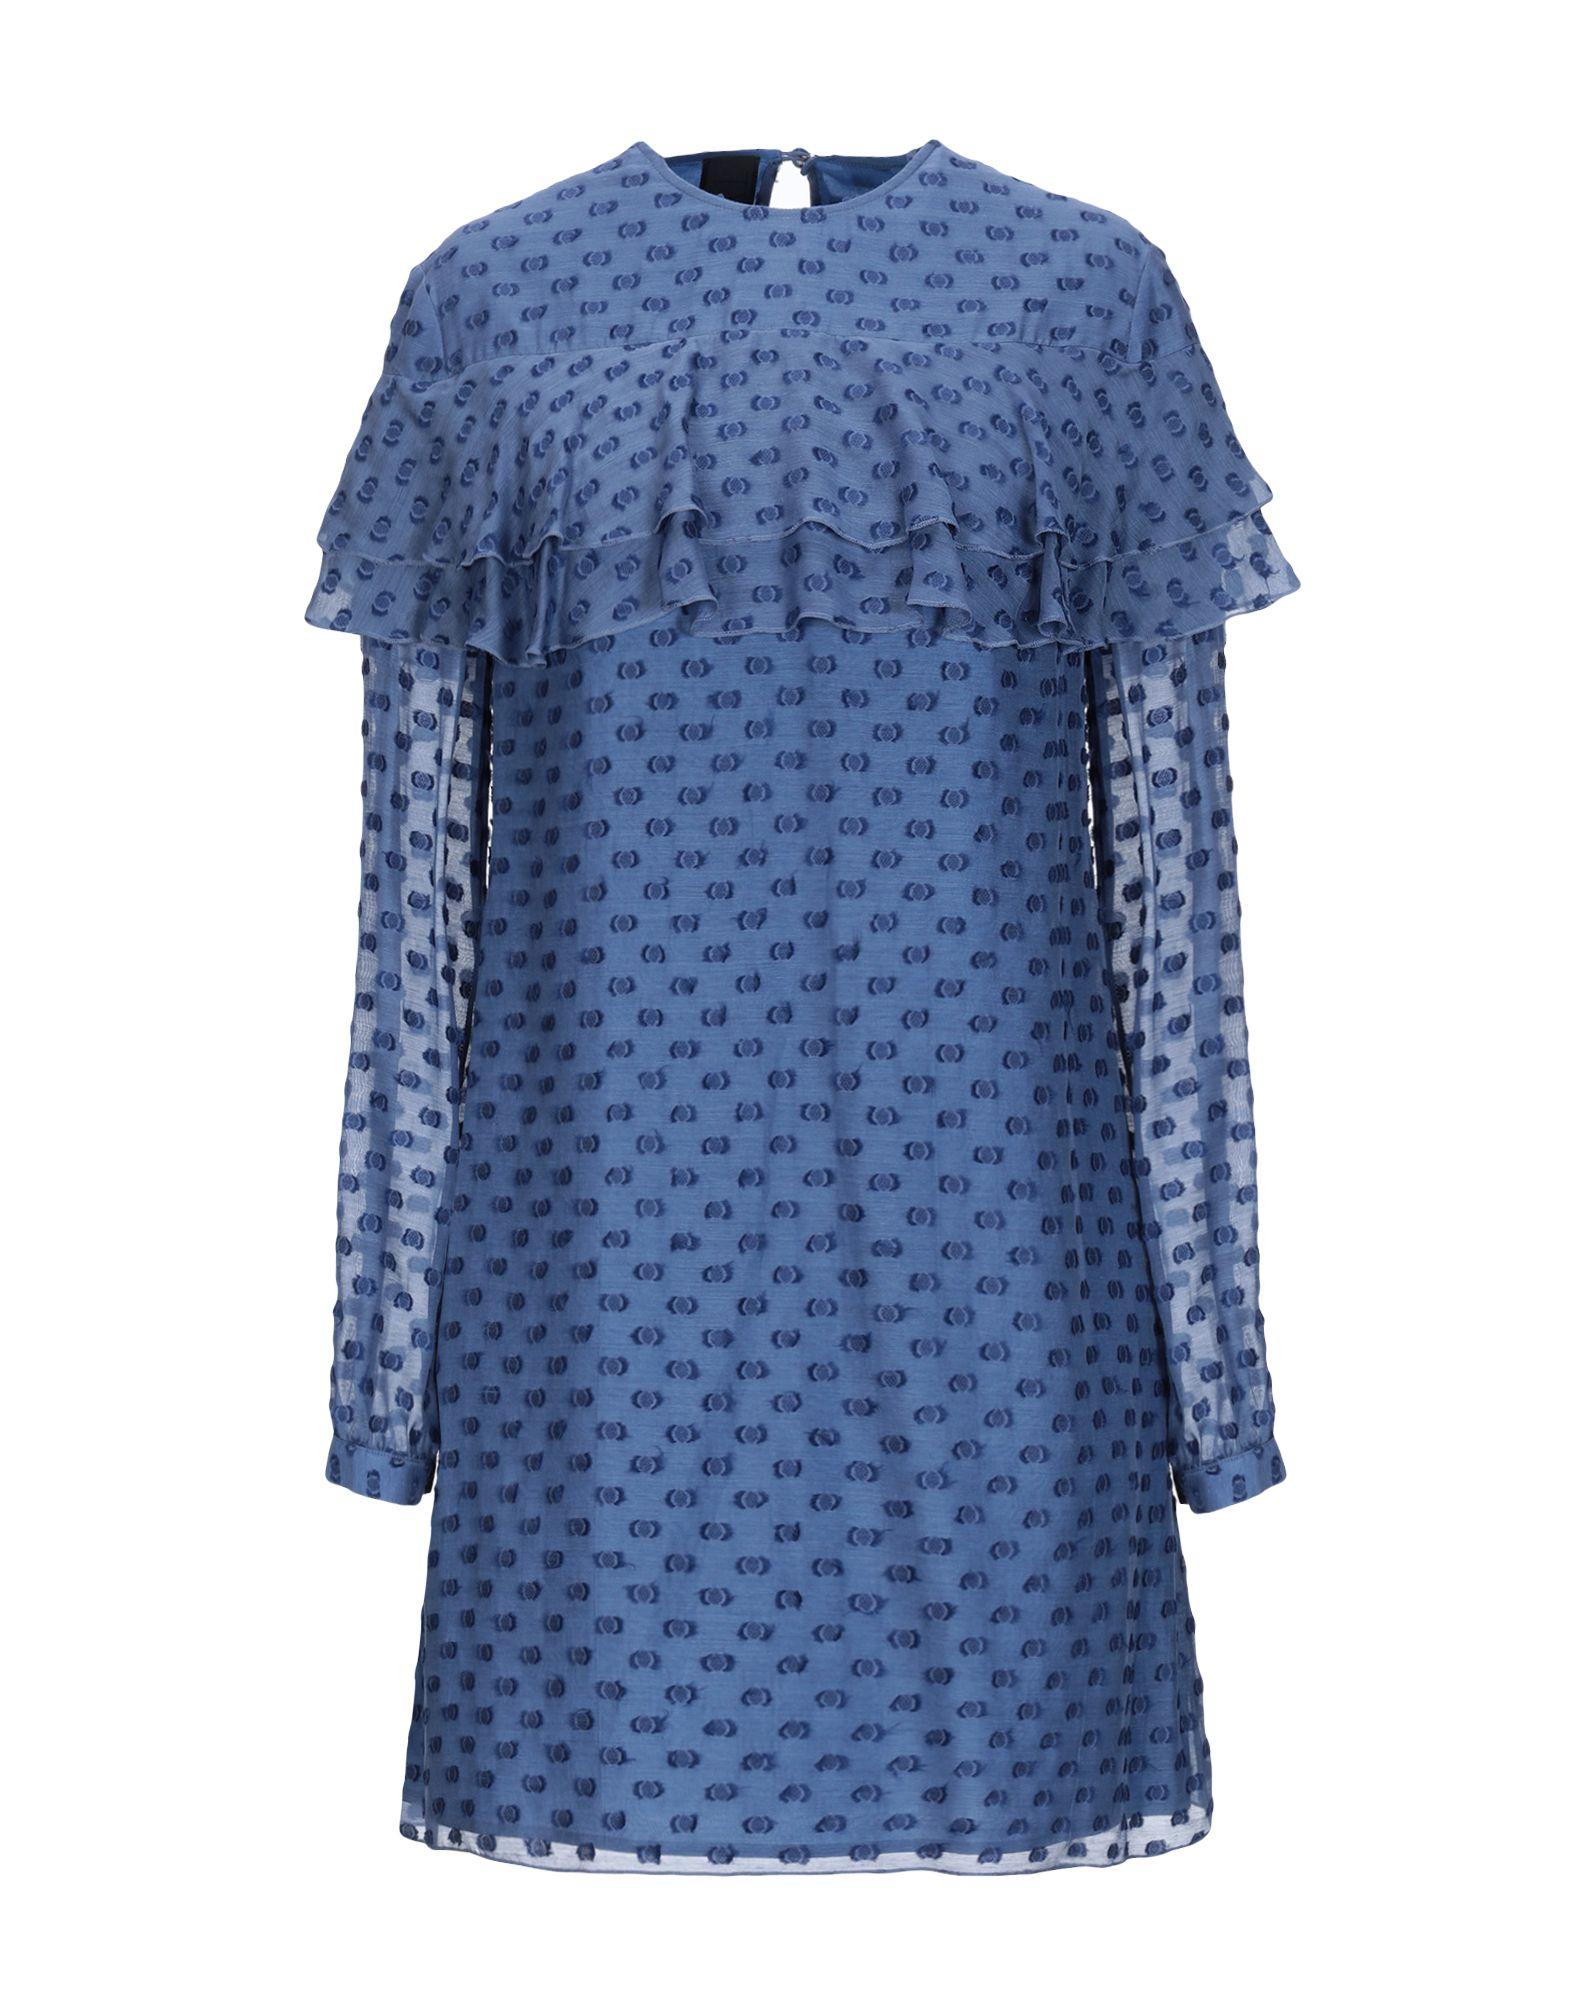 TWISTY PARALLEL UNIVERSE Короткое платье